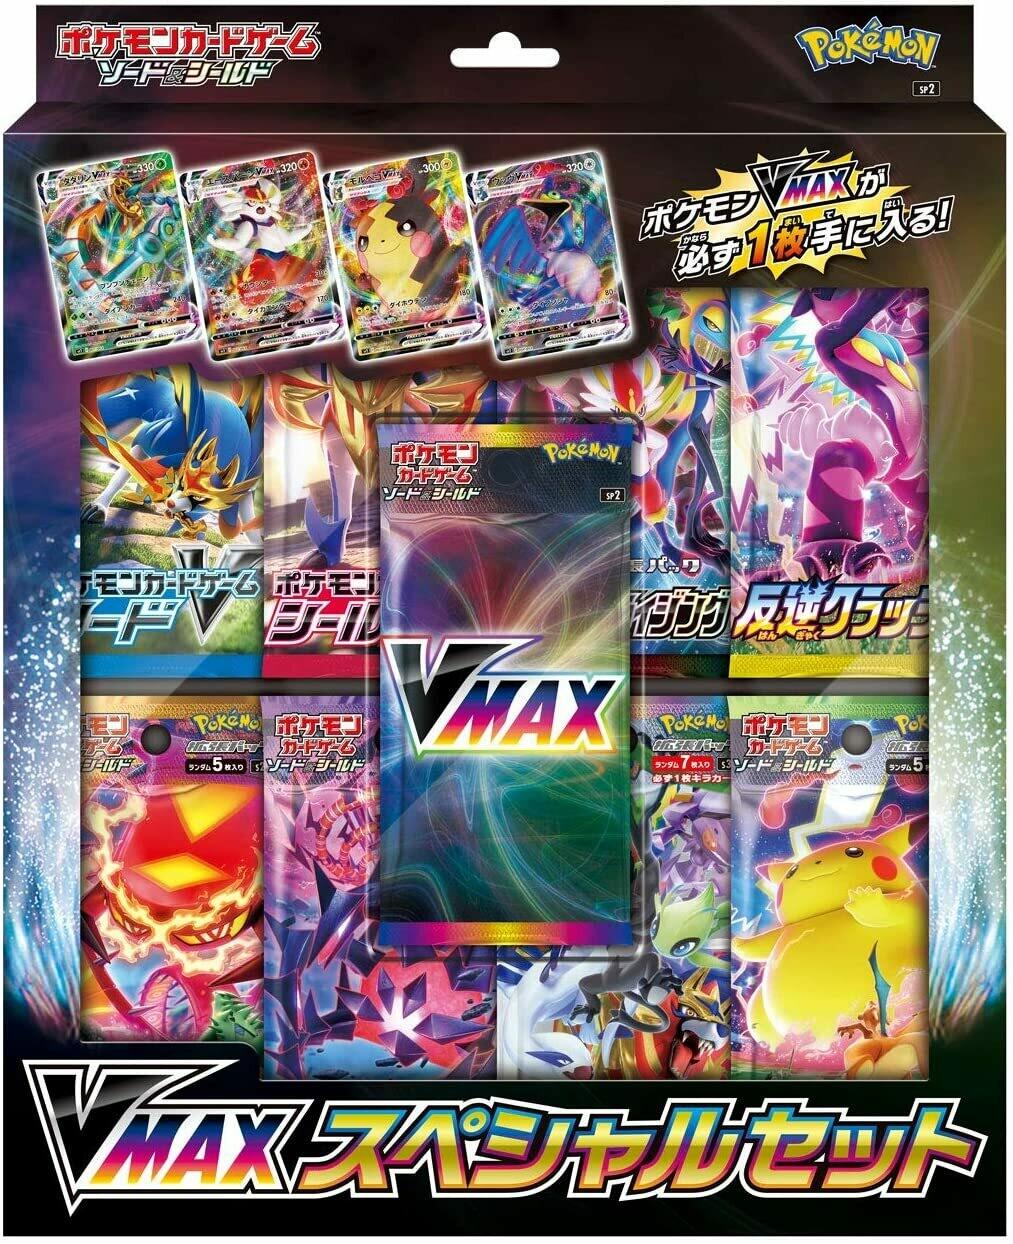 Pokemon [Pocket Monsters - Japanese] Sword & Shield VMAX Special Set